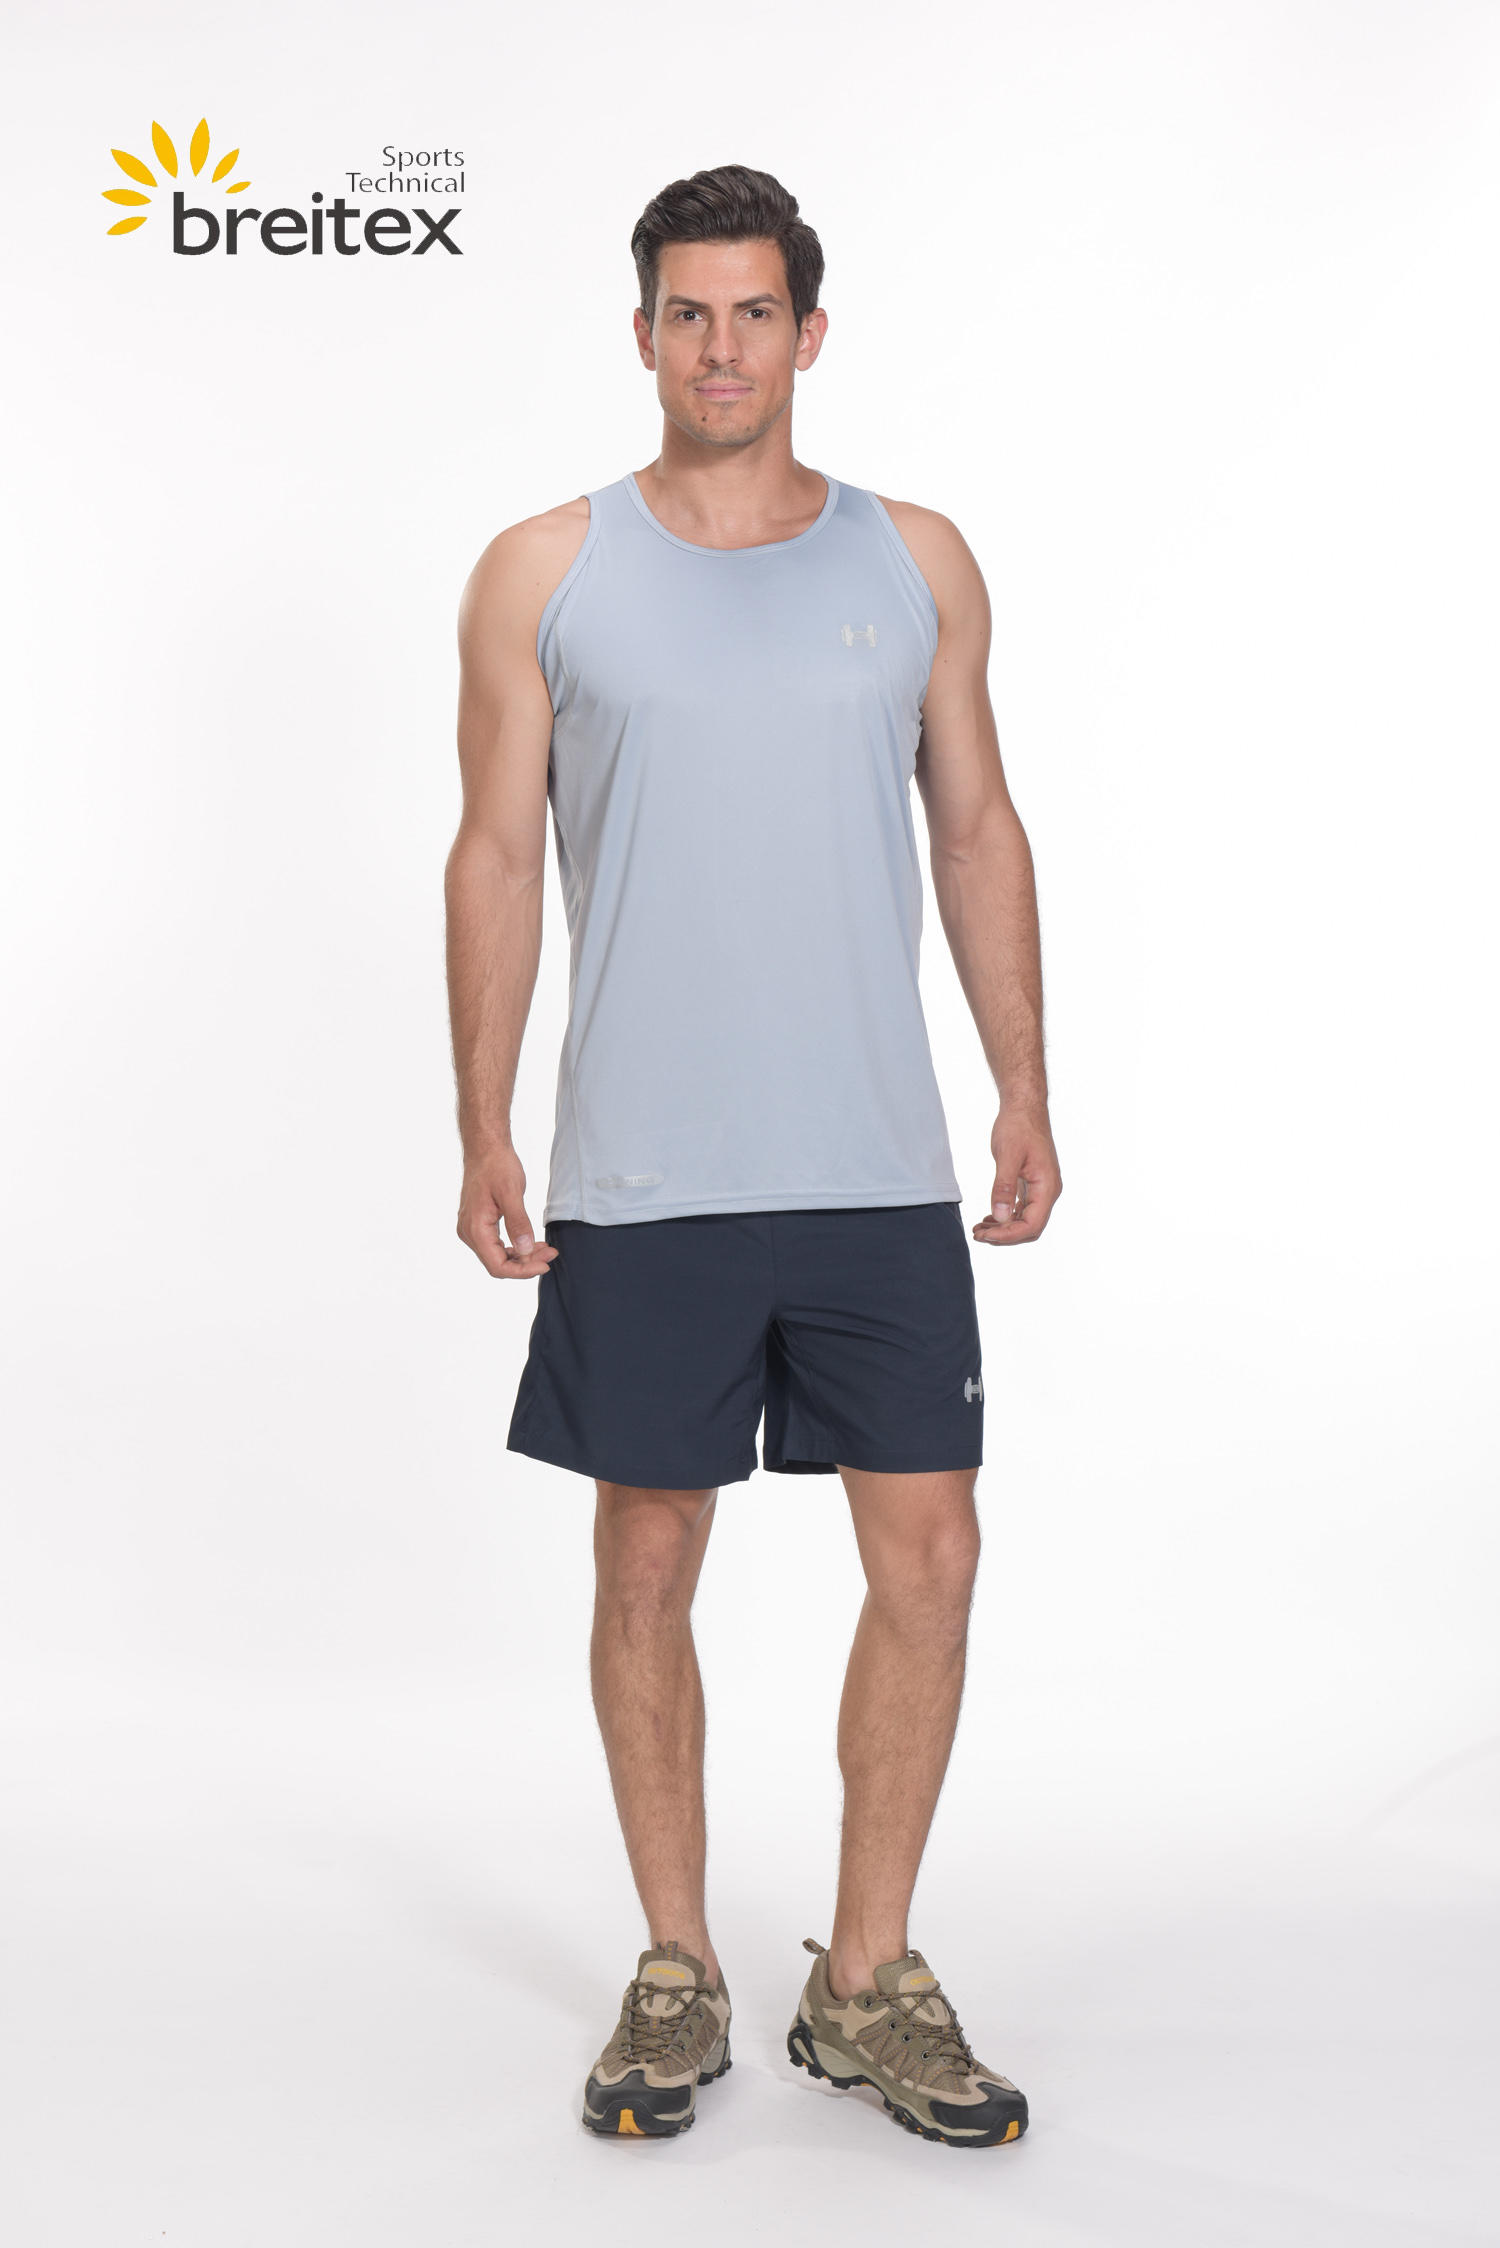 product-Breitex-Men Running Sleeveless Grey T-Shirt BT20SP0319005-RUNNING WEAR - on sale-img